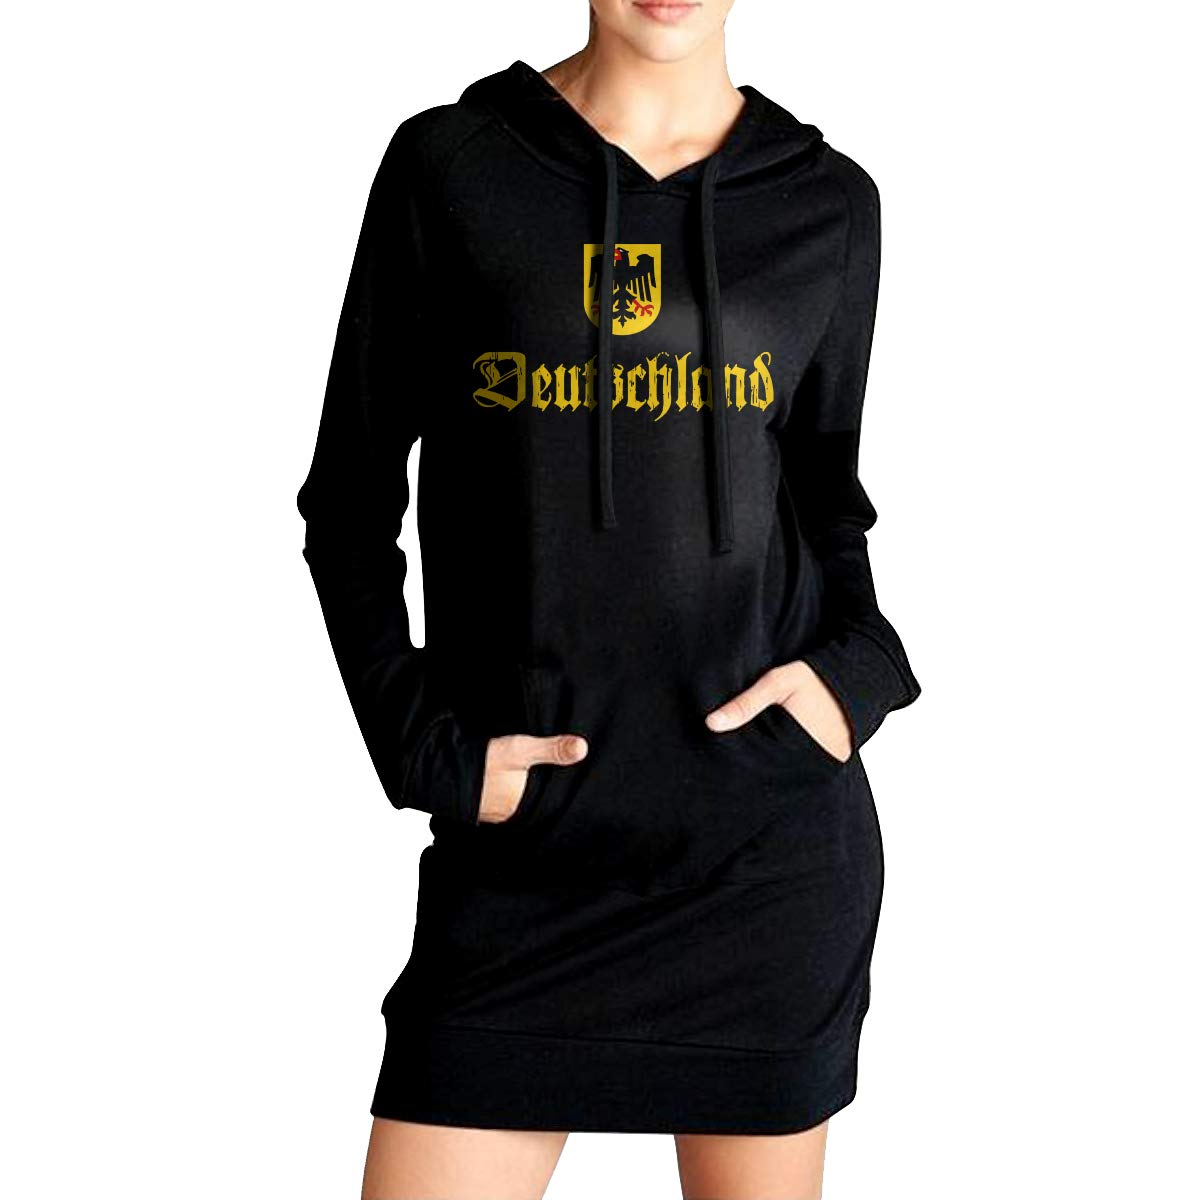 Vintage Deutschland German Sport Outwear with Pockets Womens Slim Fit Fleece Long Hoodies Dress